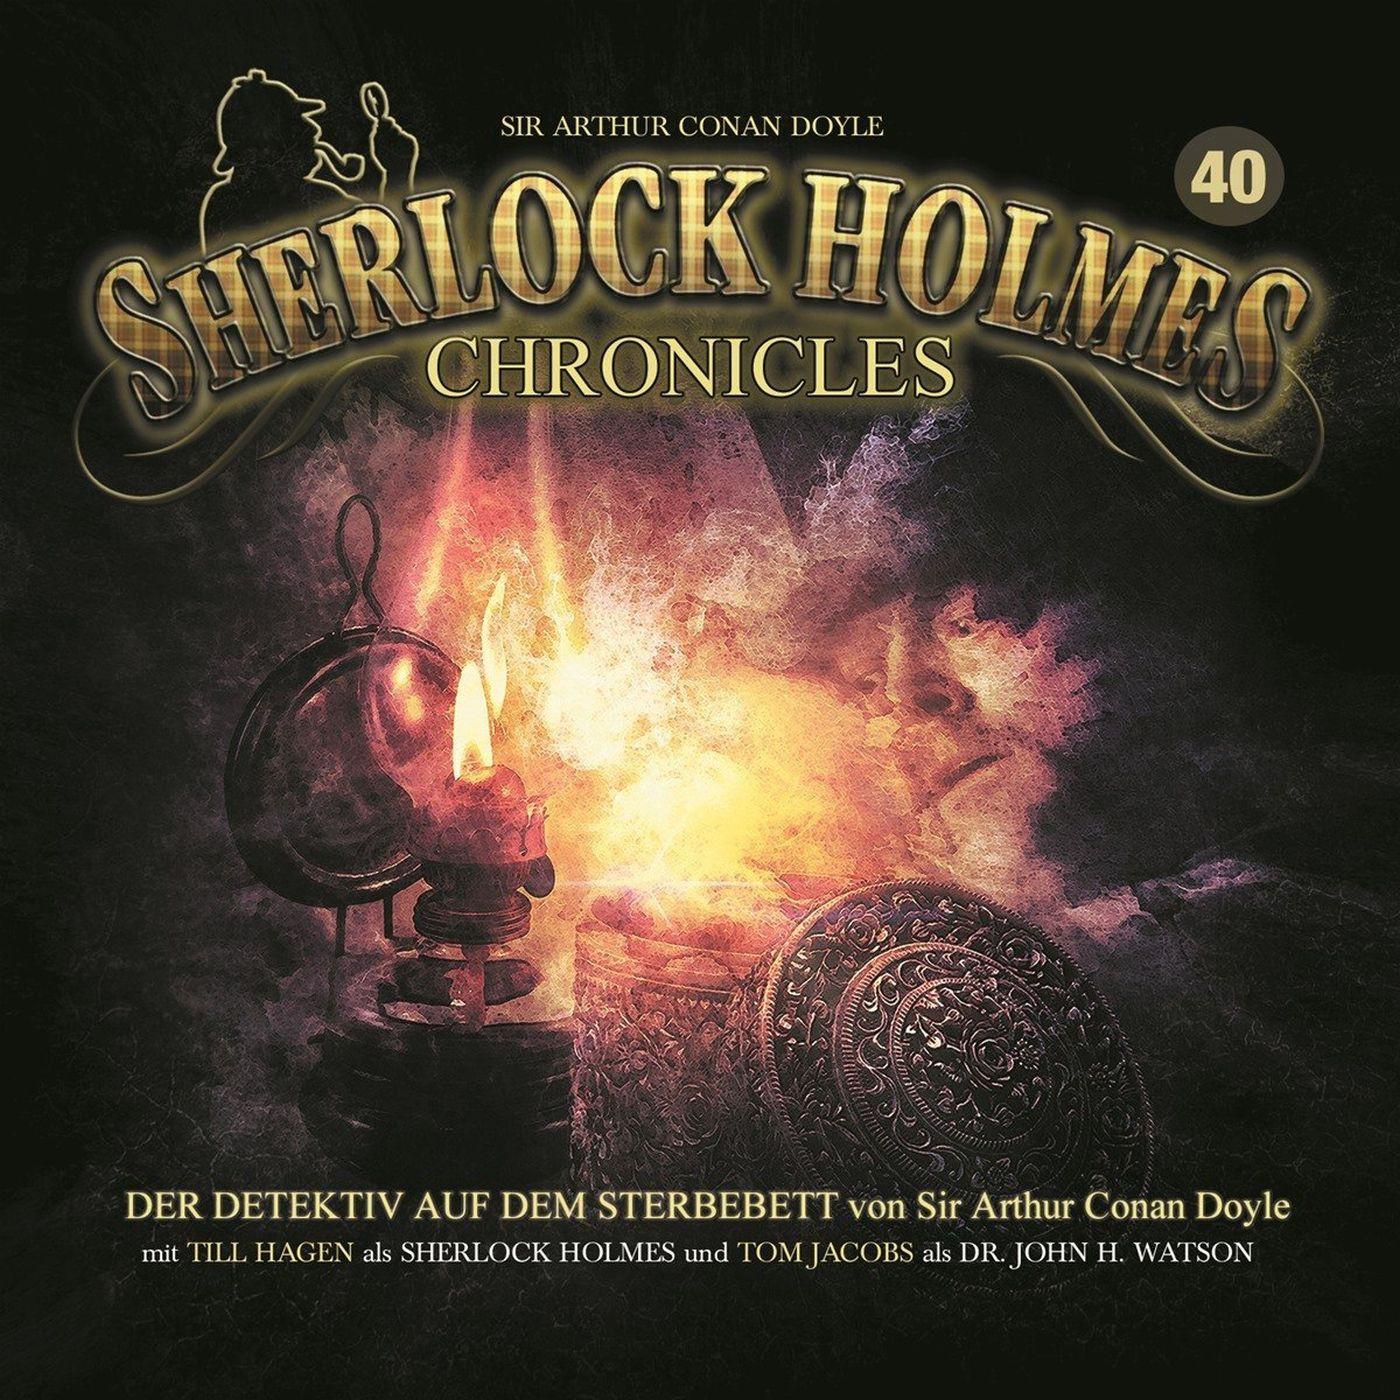 Sherlock Holmes Chronicles 40 Der Detektiv auf dem Sterbebett